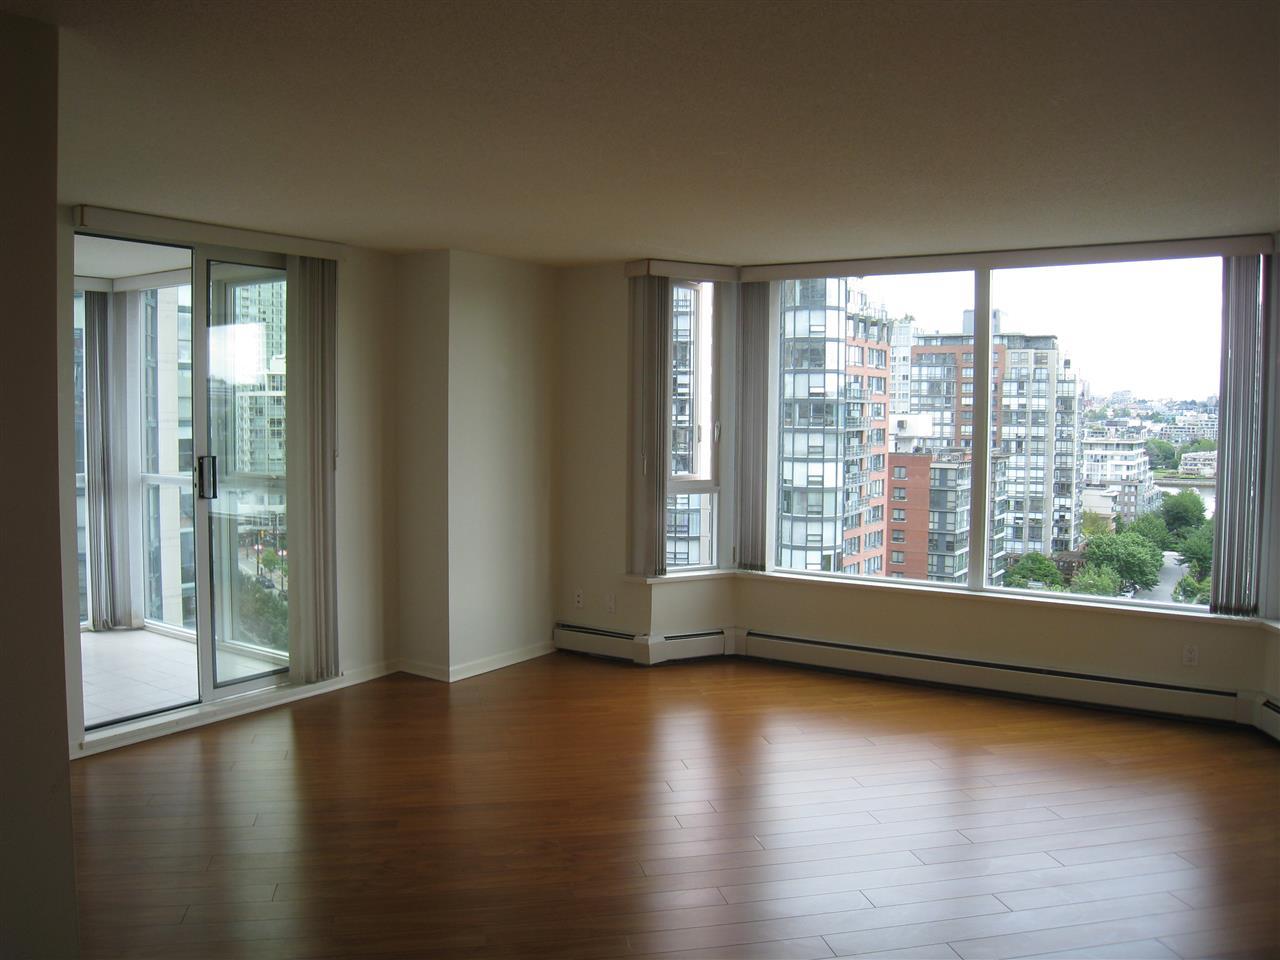 Condo Apartment at 1305 388 DRAKE STREET, Unit 1305, Vancouver West, British Columbia. Image 2